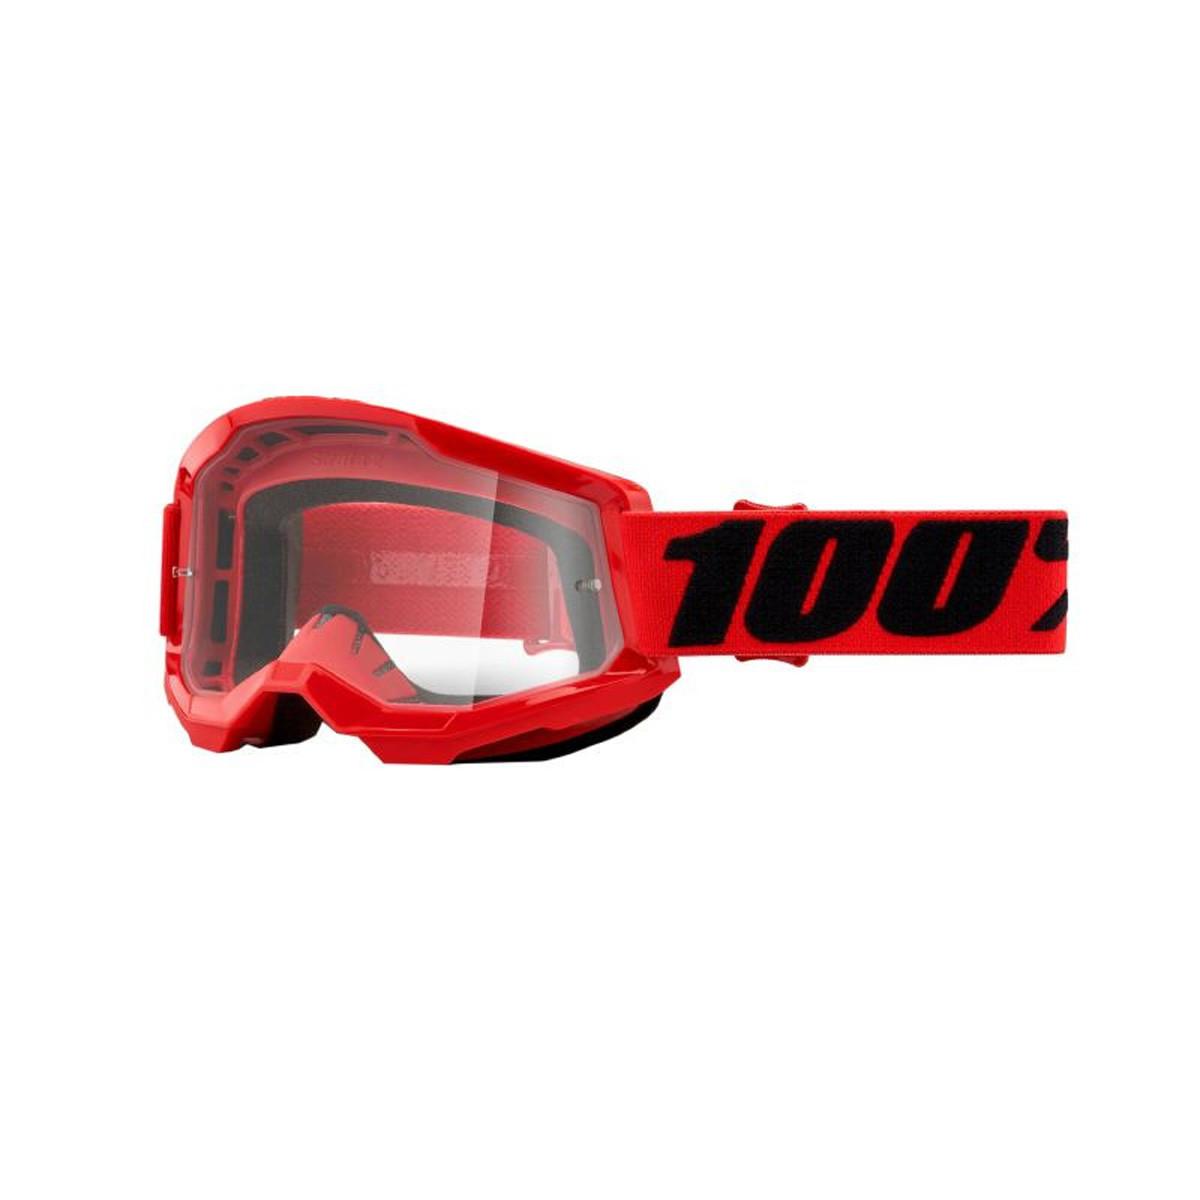 Masque / Lunettes Cross - 100% Strata 2 Essentiel Rouge Ecran Transparent